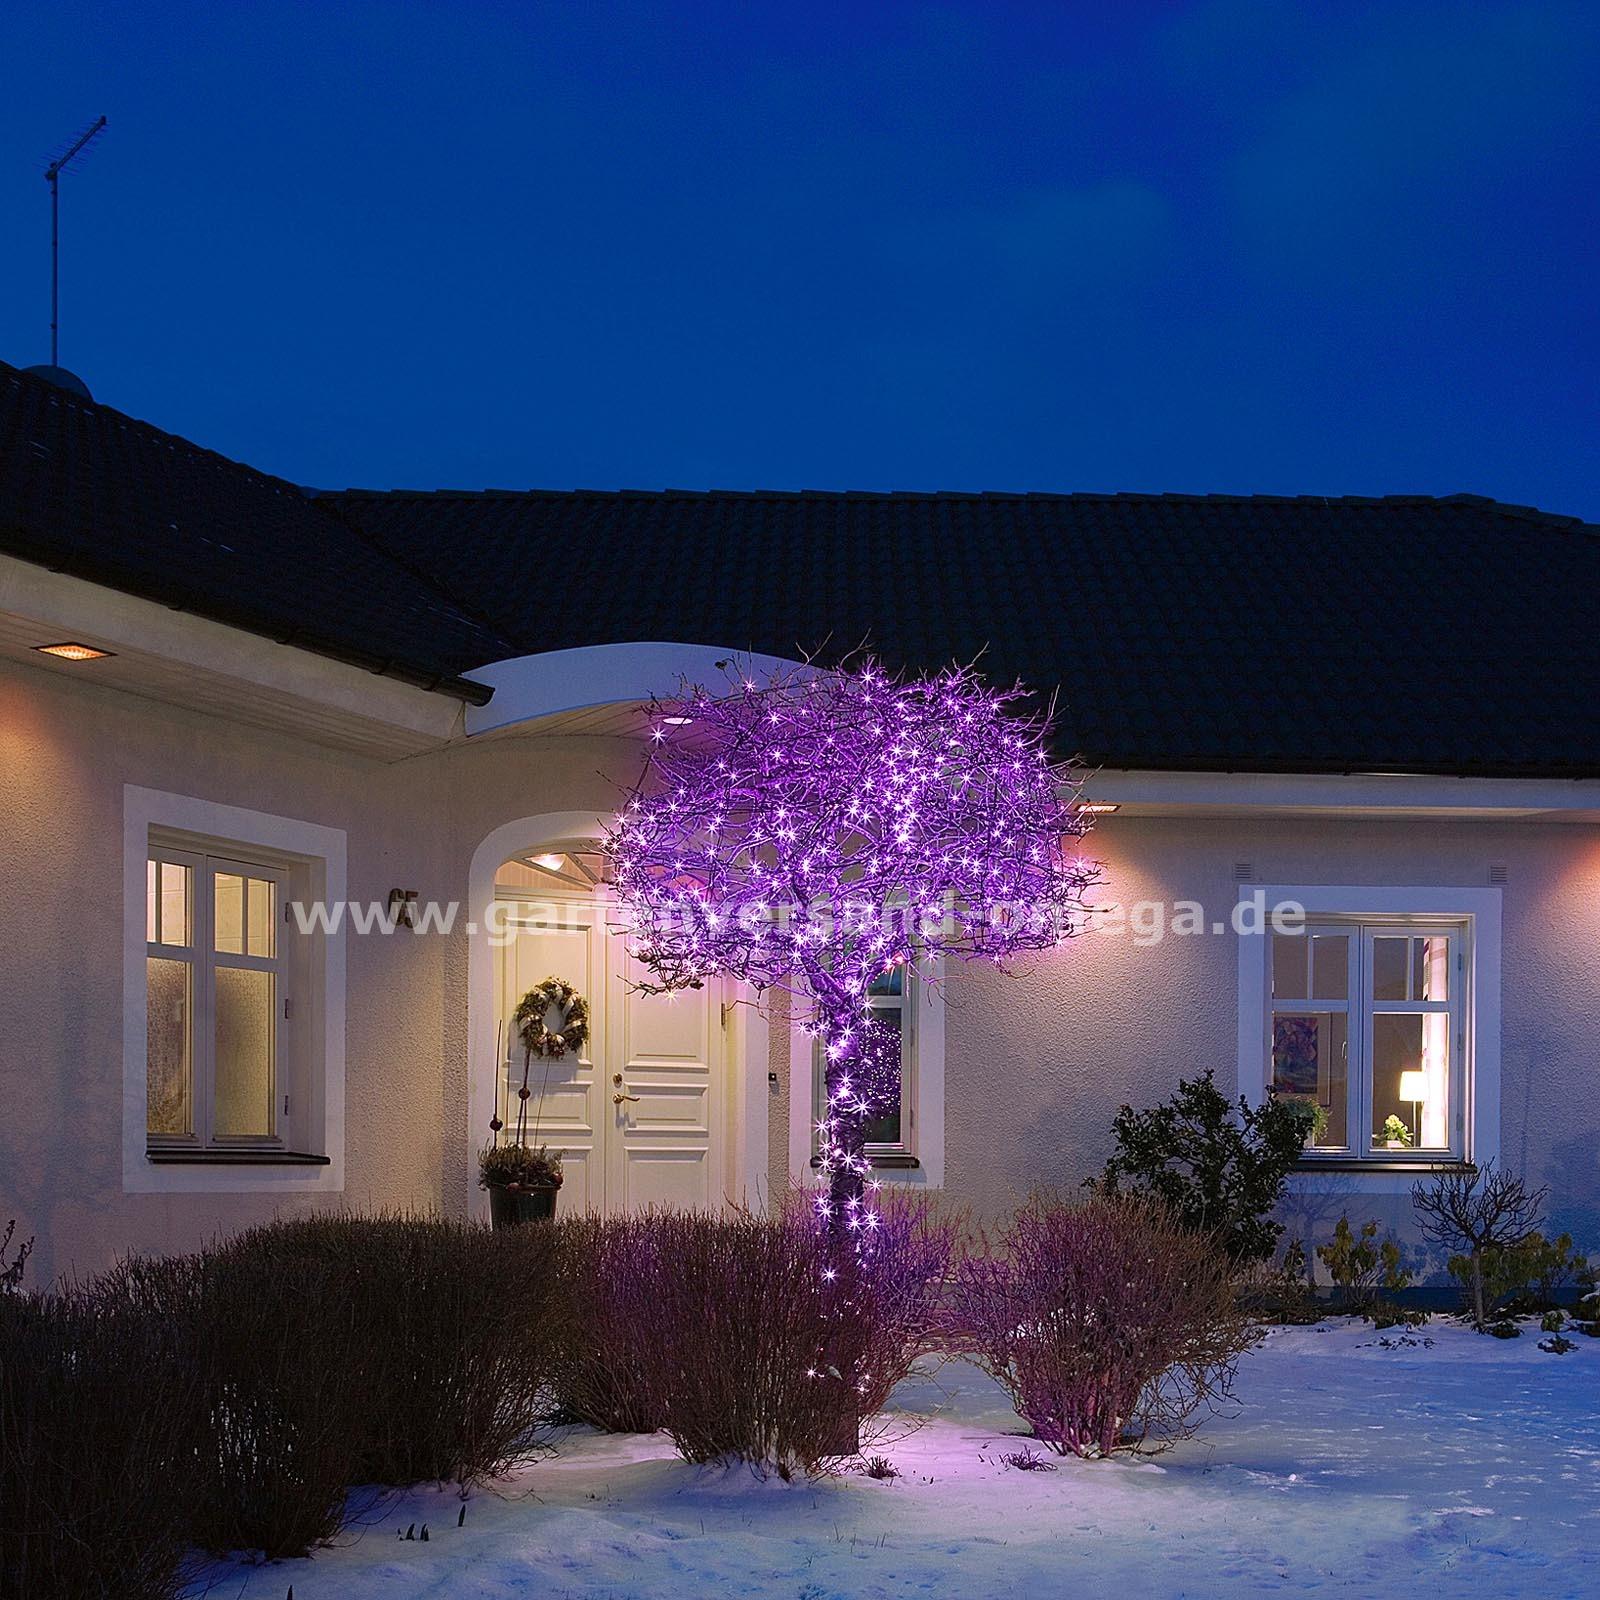 mikro led lichterkette in verschiedenen farben bunte led. Black Bedroom Furniture Sets. Home Design Ideas